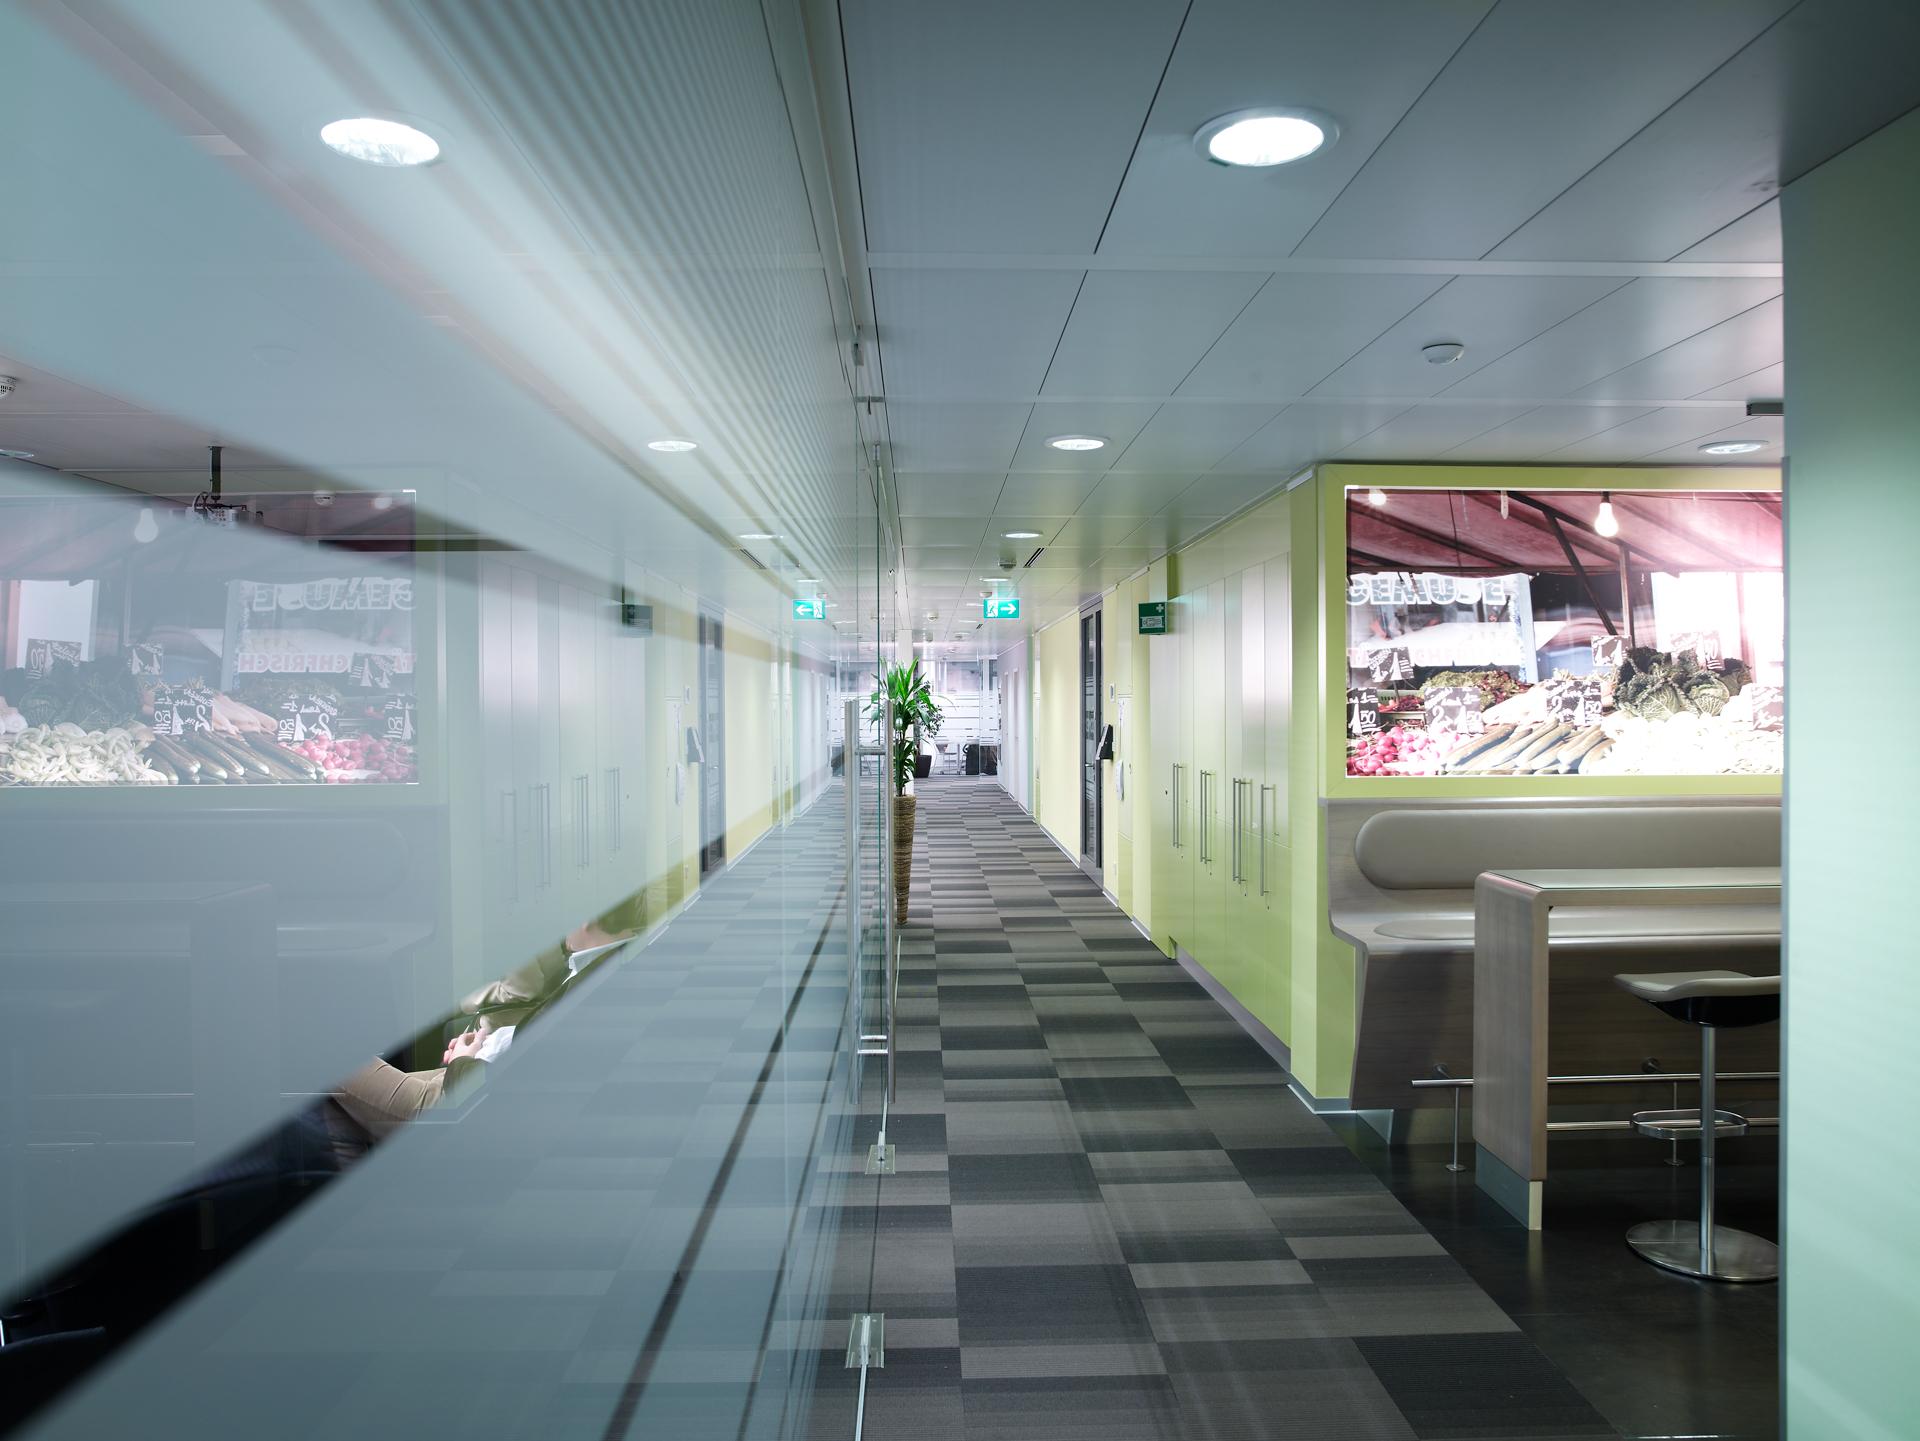 Gang zum Aufenthaltsbereich im Büro Nycomed Pharma, designed von Studio Thörnblom